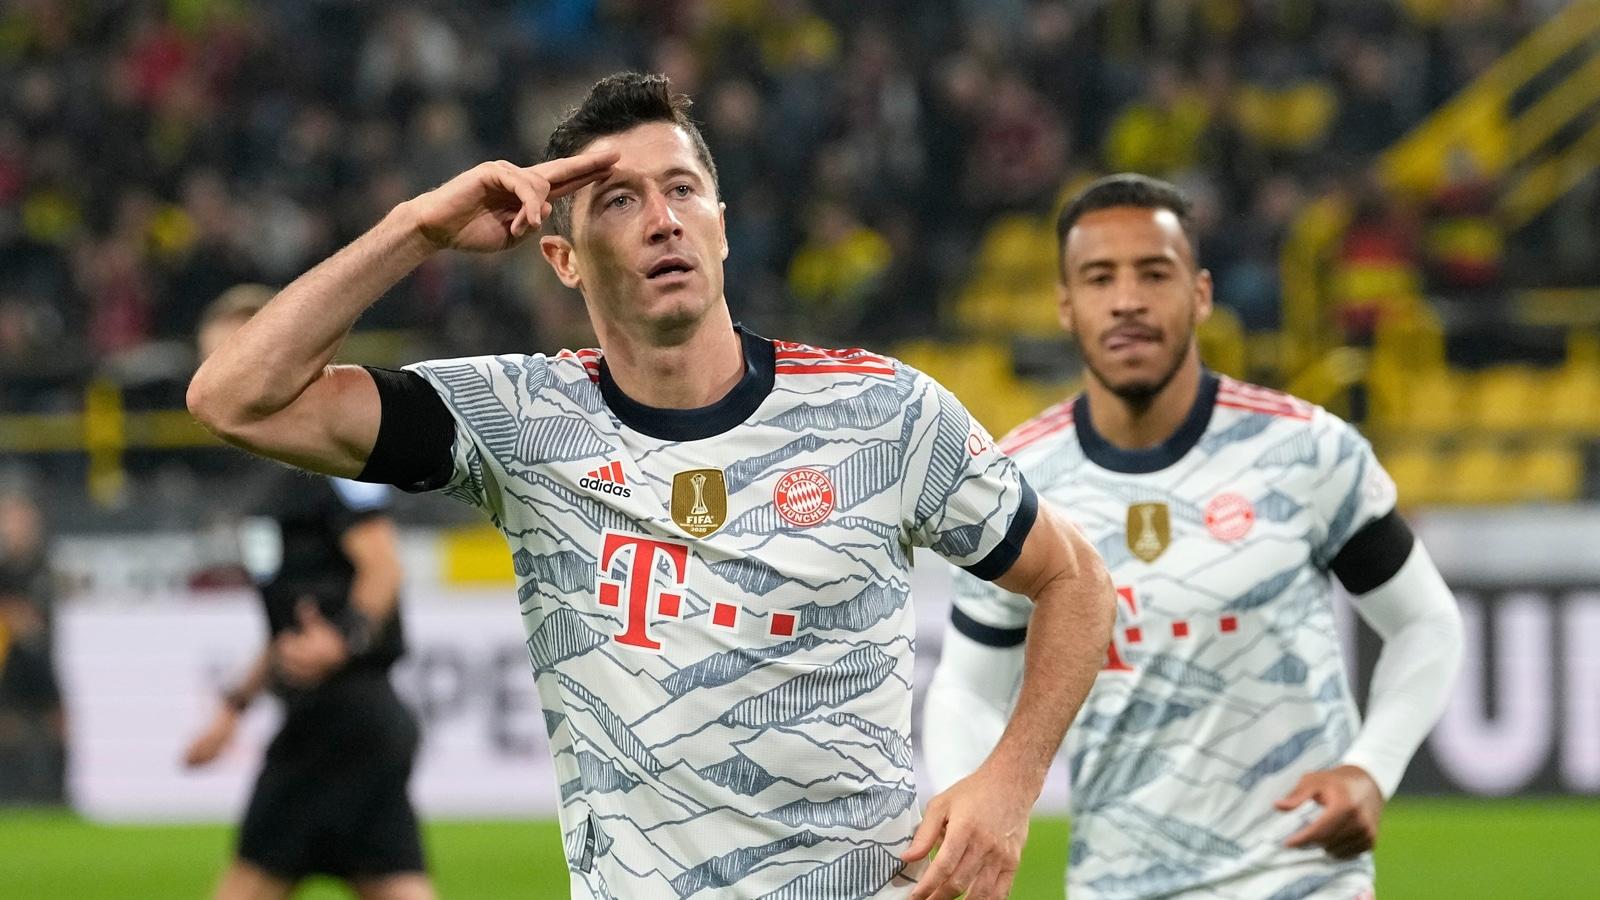 Lewandowski leads Bayern to German Super Cup win in Dortmund